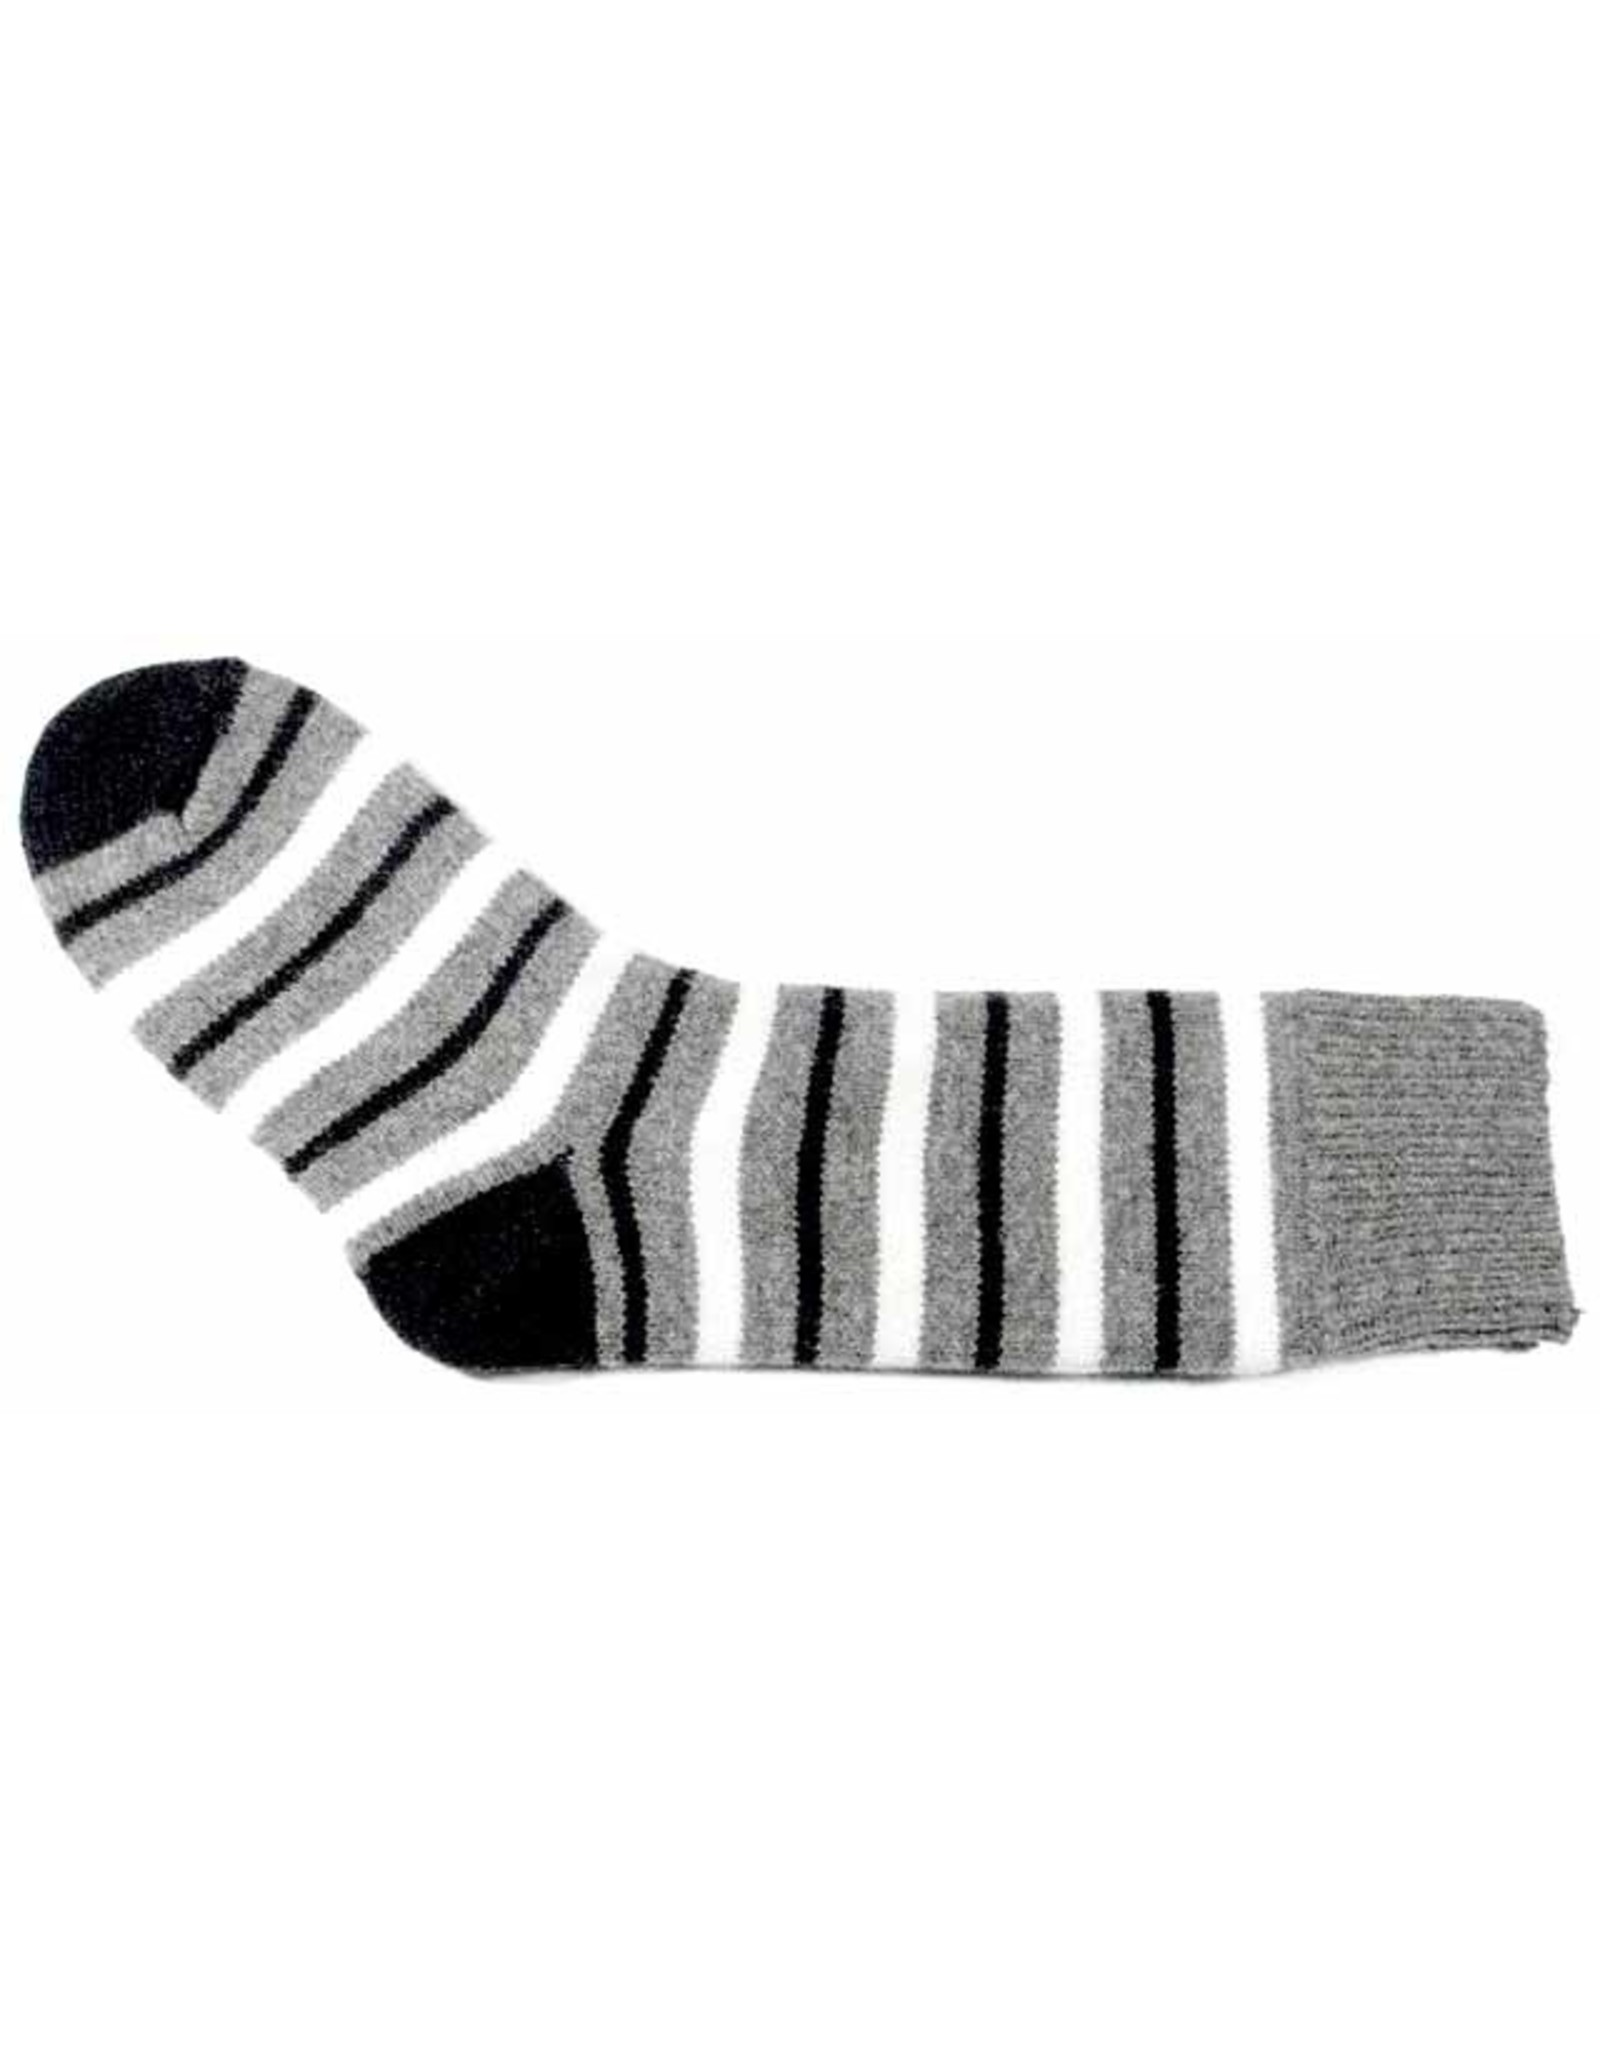 Bas de laine & mot coquin - Socks The Intellingent (Grey/Blue and White)